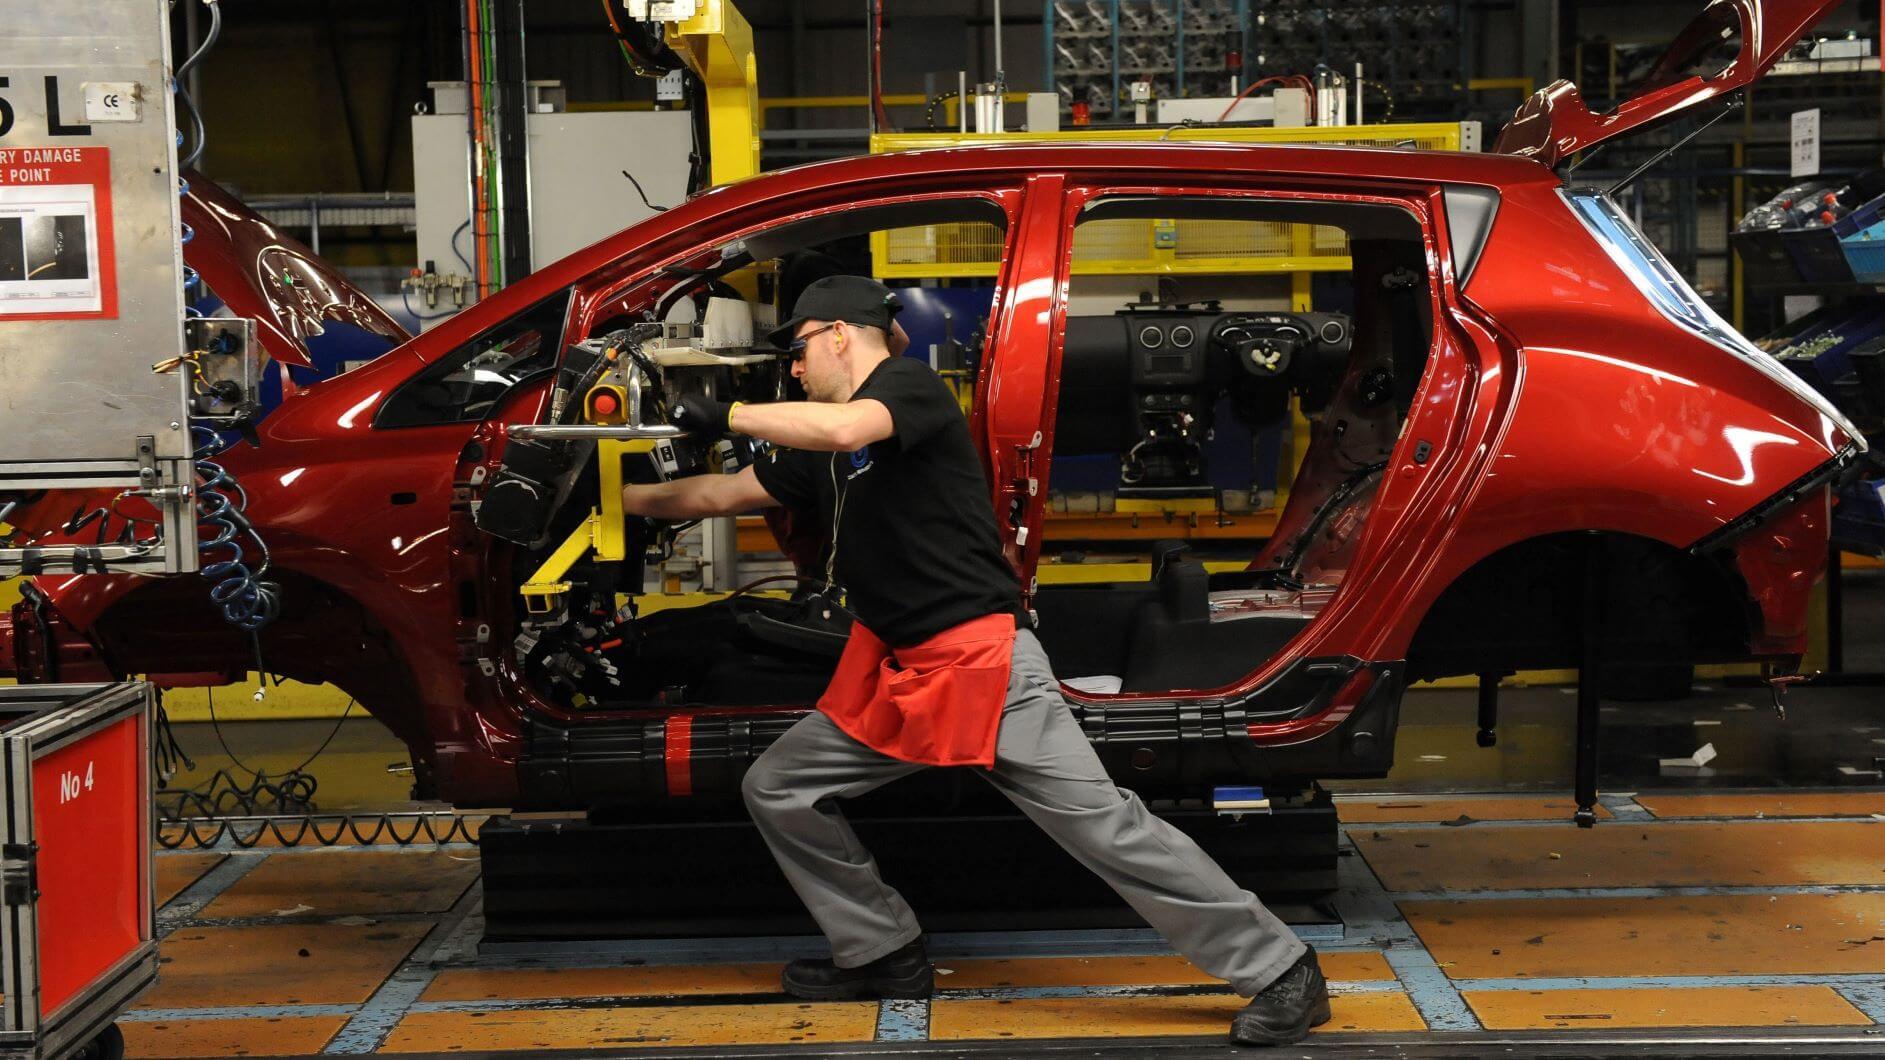 UK Economy 'Spluttering' Despite Return To Growth, Say Analysts